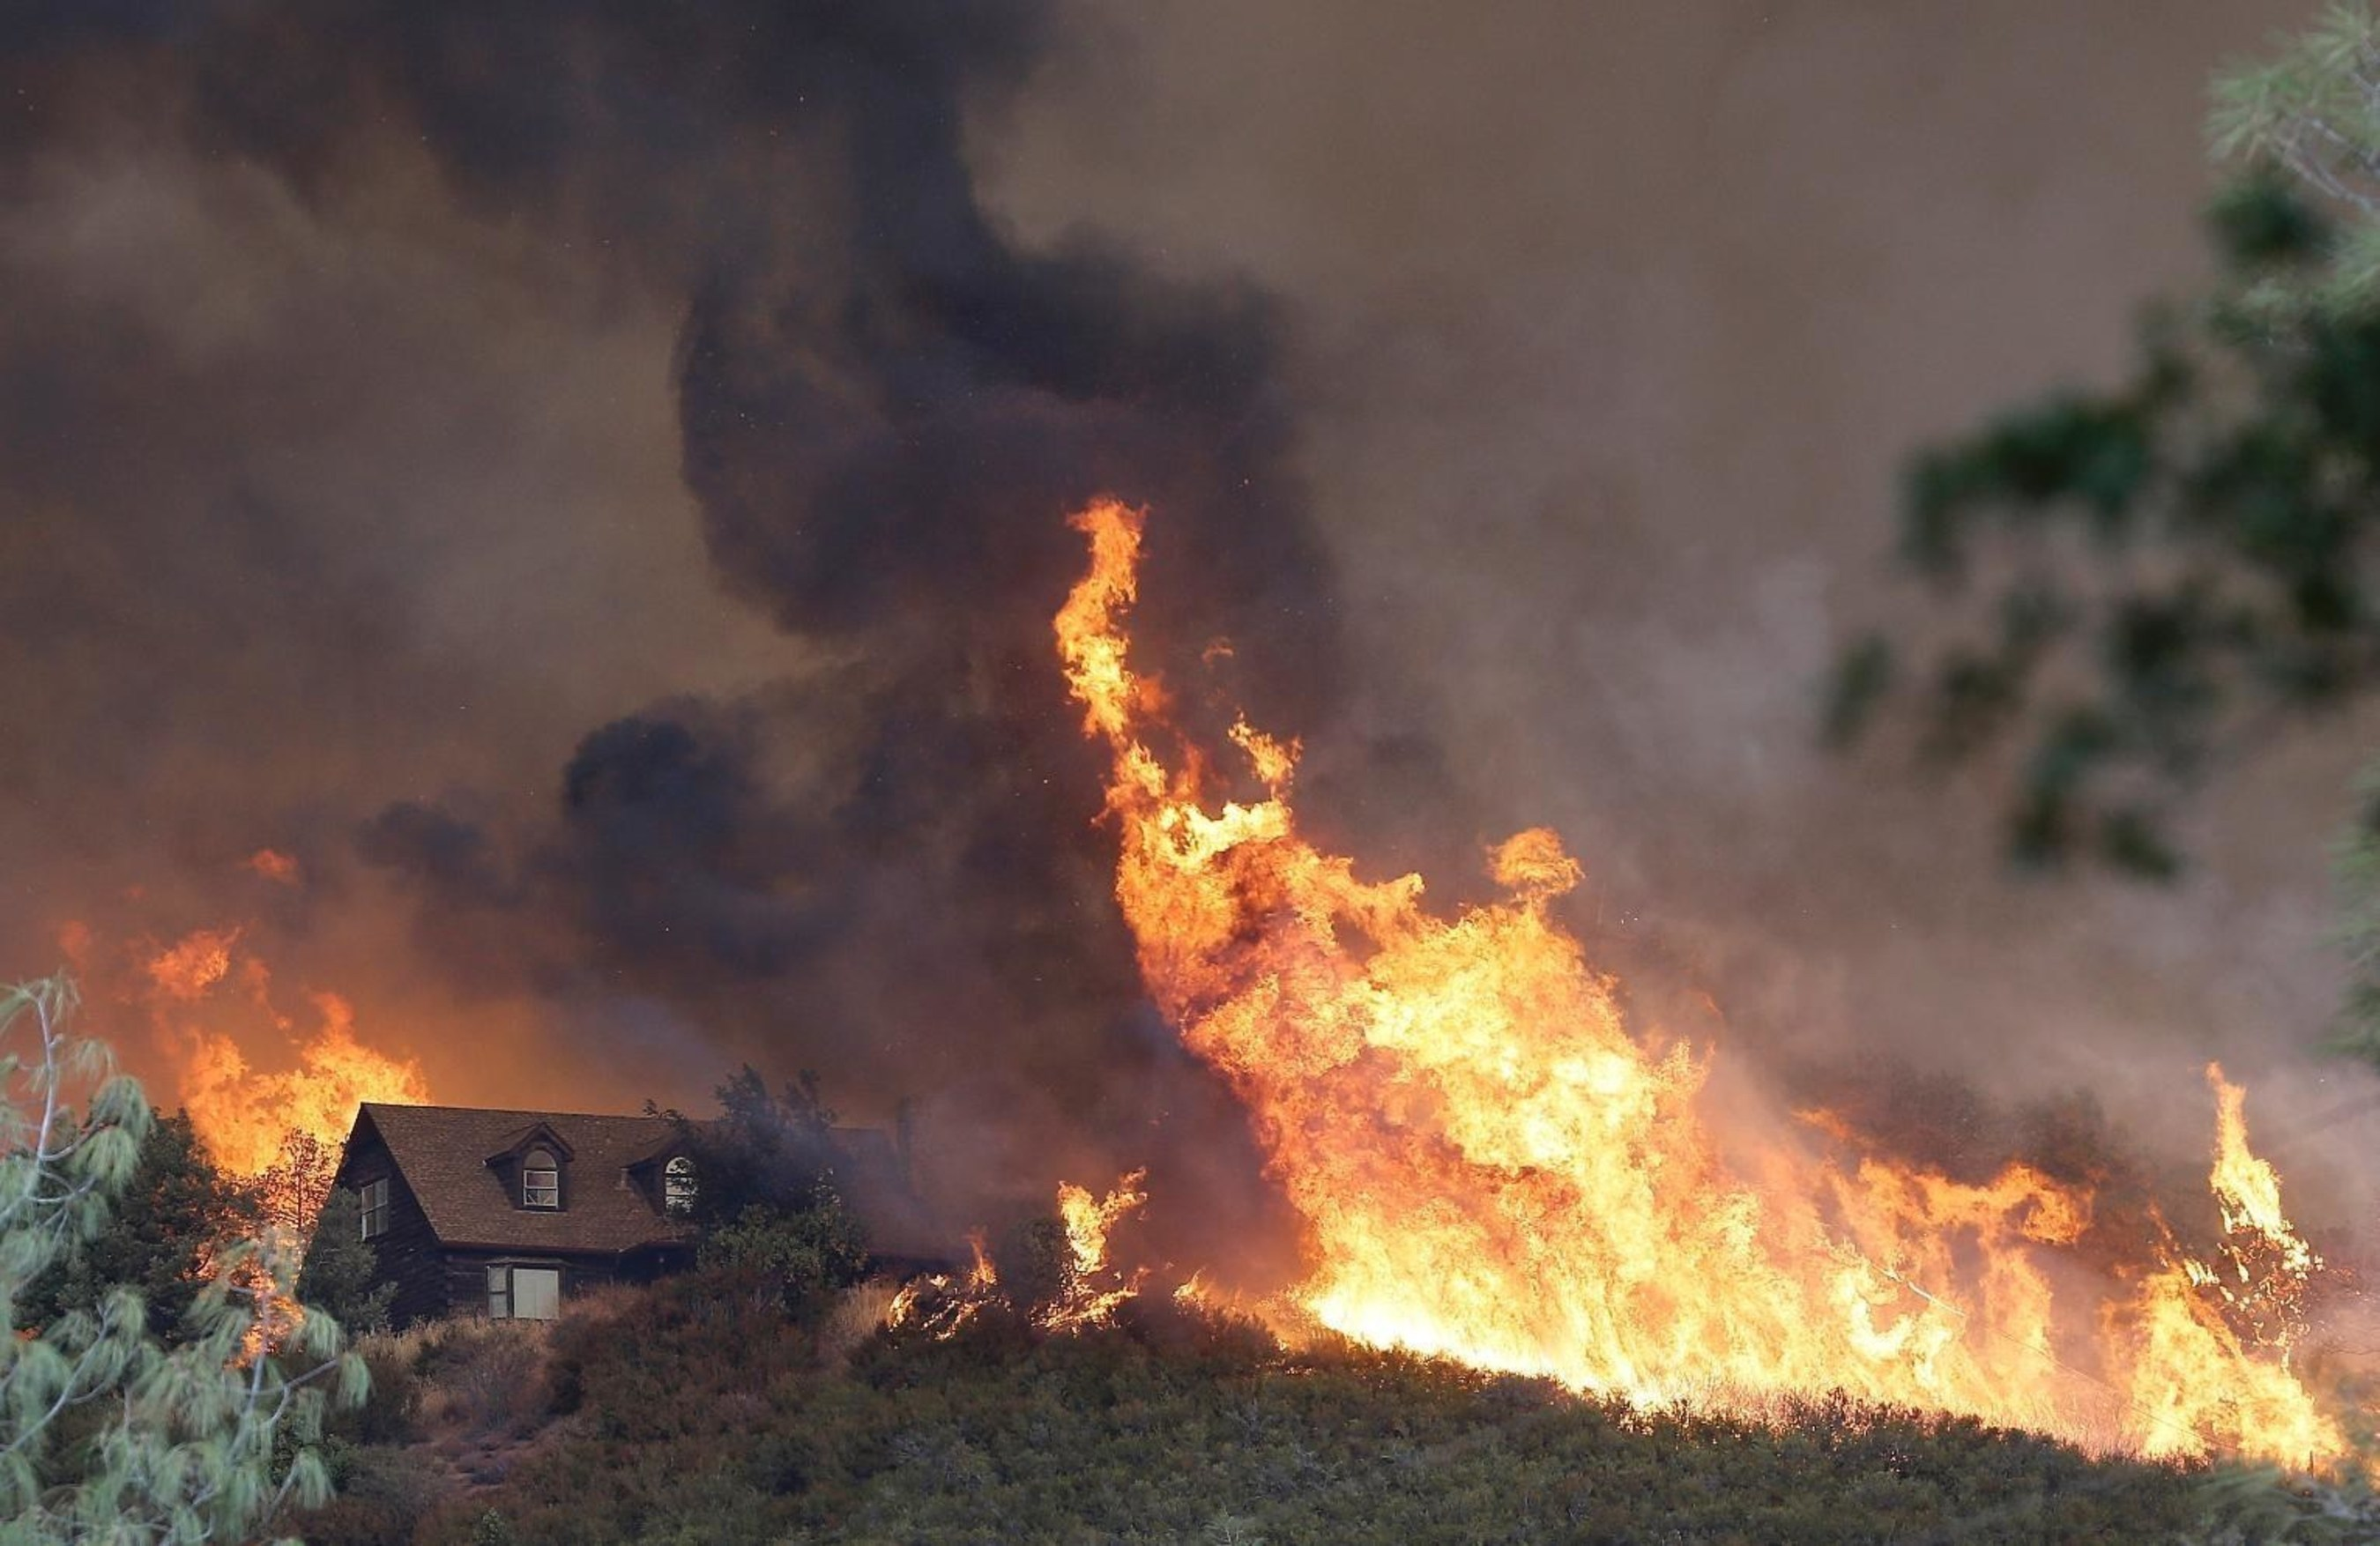 Trees For Sale Online Nursery: West Coast Drought, Wildfires Threaten Tree Population across Seven